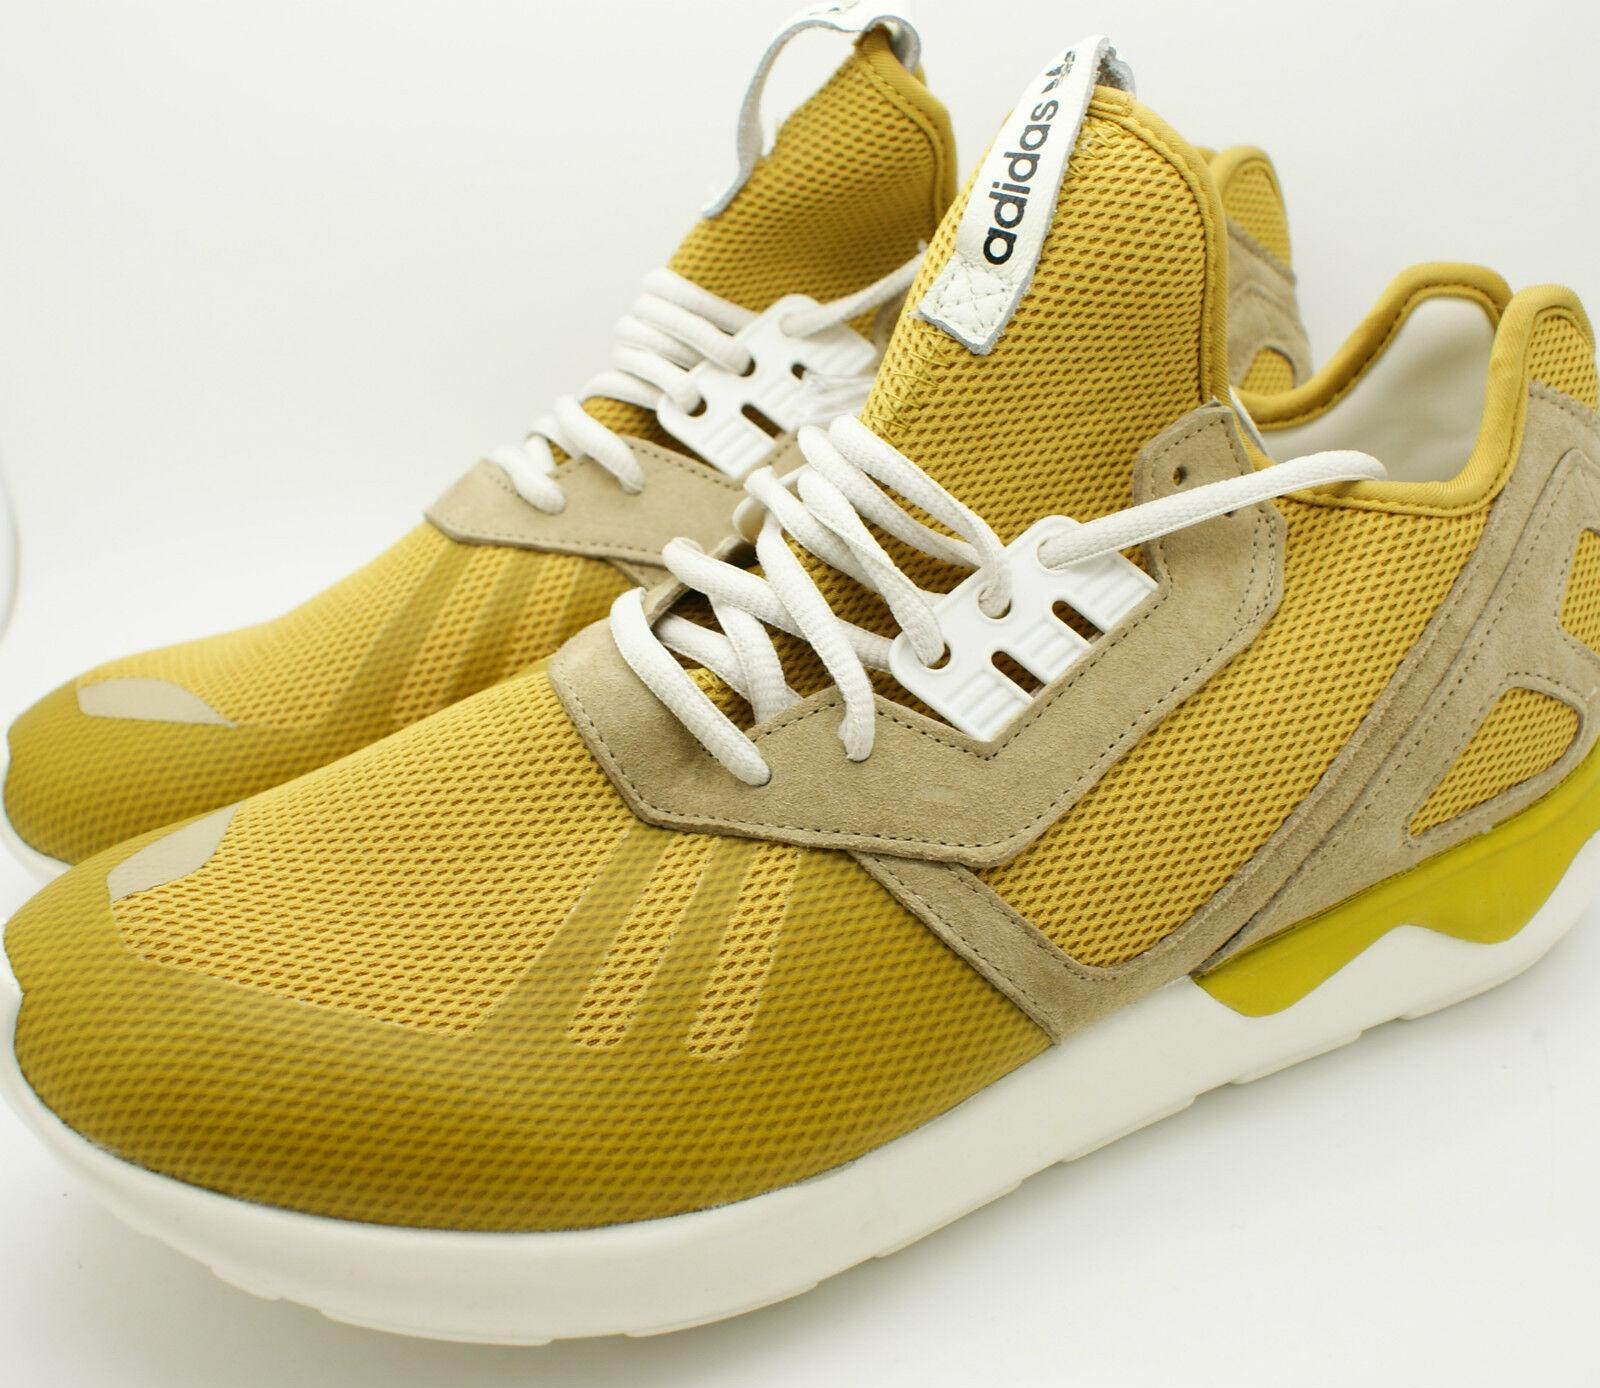 Adidas Originals Mens Tubular Runner Sneaker B23886 Shoe Yellow x Hemp B23886 Sneaker 12 NEW 0ad61c